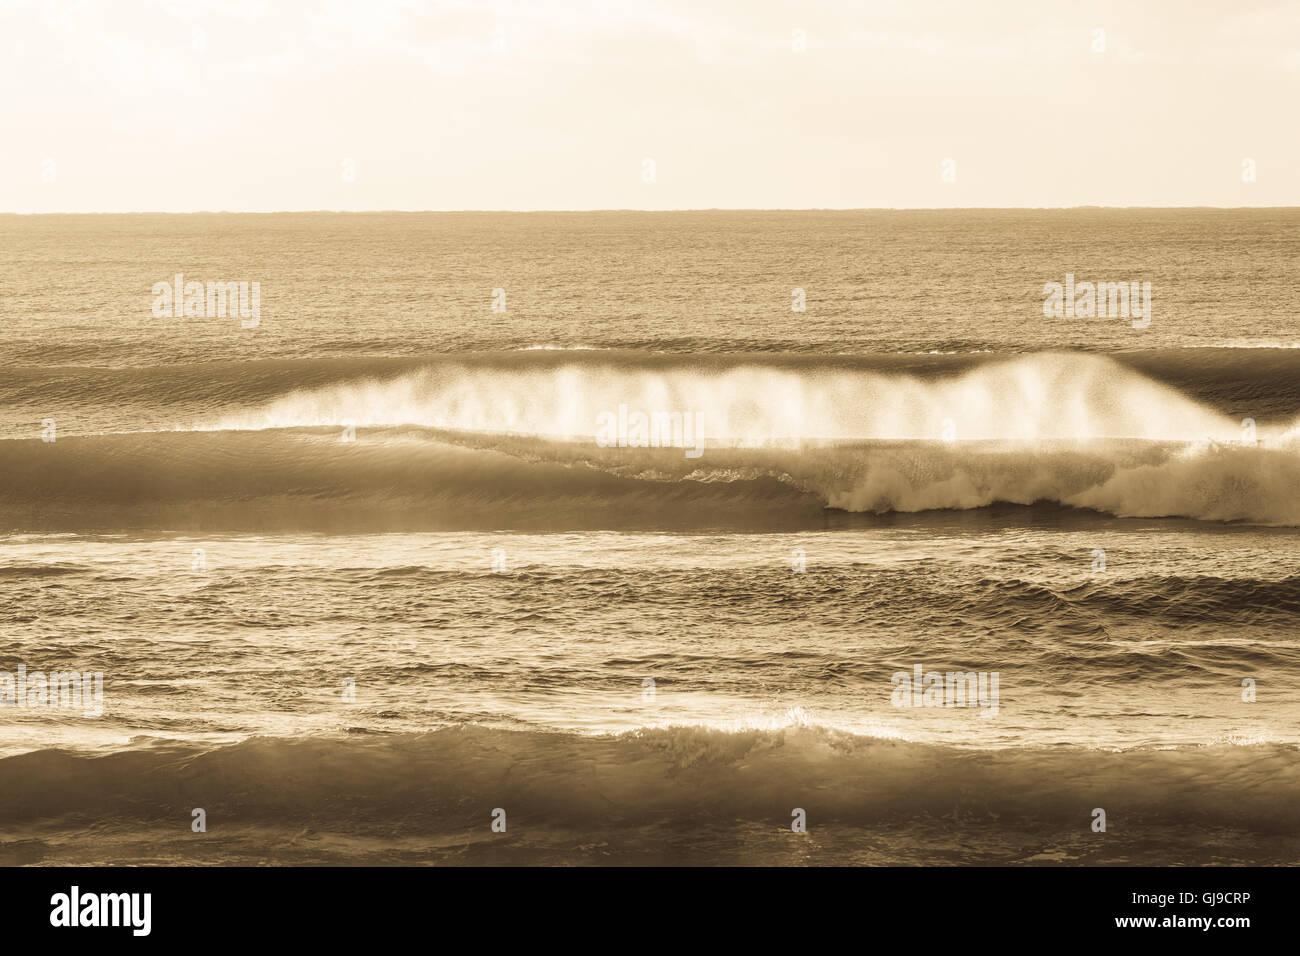 Ocean waves crashing beach coastline vintage antique sepia horizon landscape - Stock Image